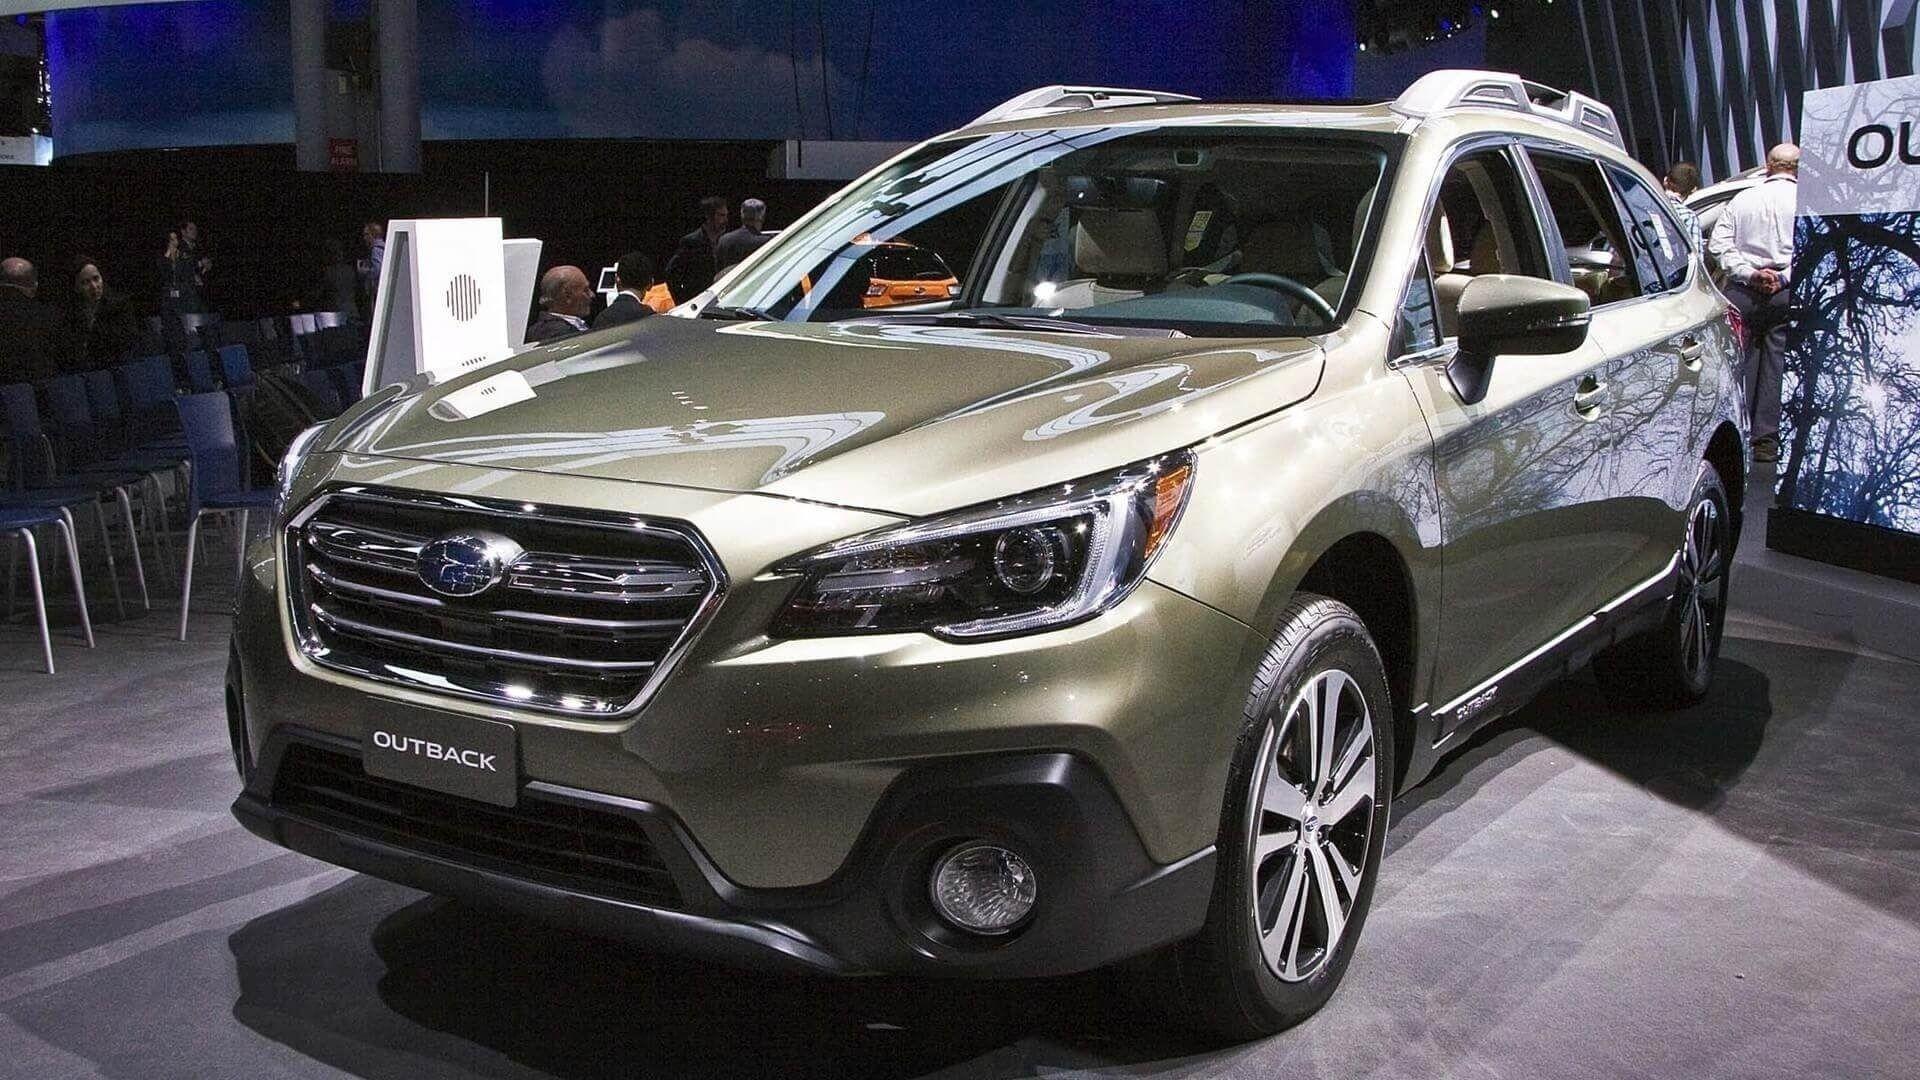 2020 Subaru Legacy Turbo Release Date Price And Review Subaru Outback Subaru Legacy Subaru